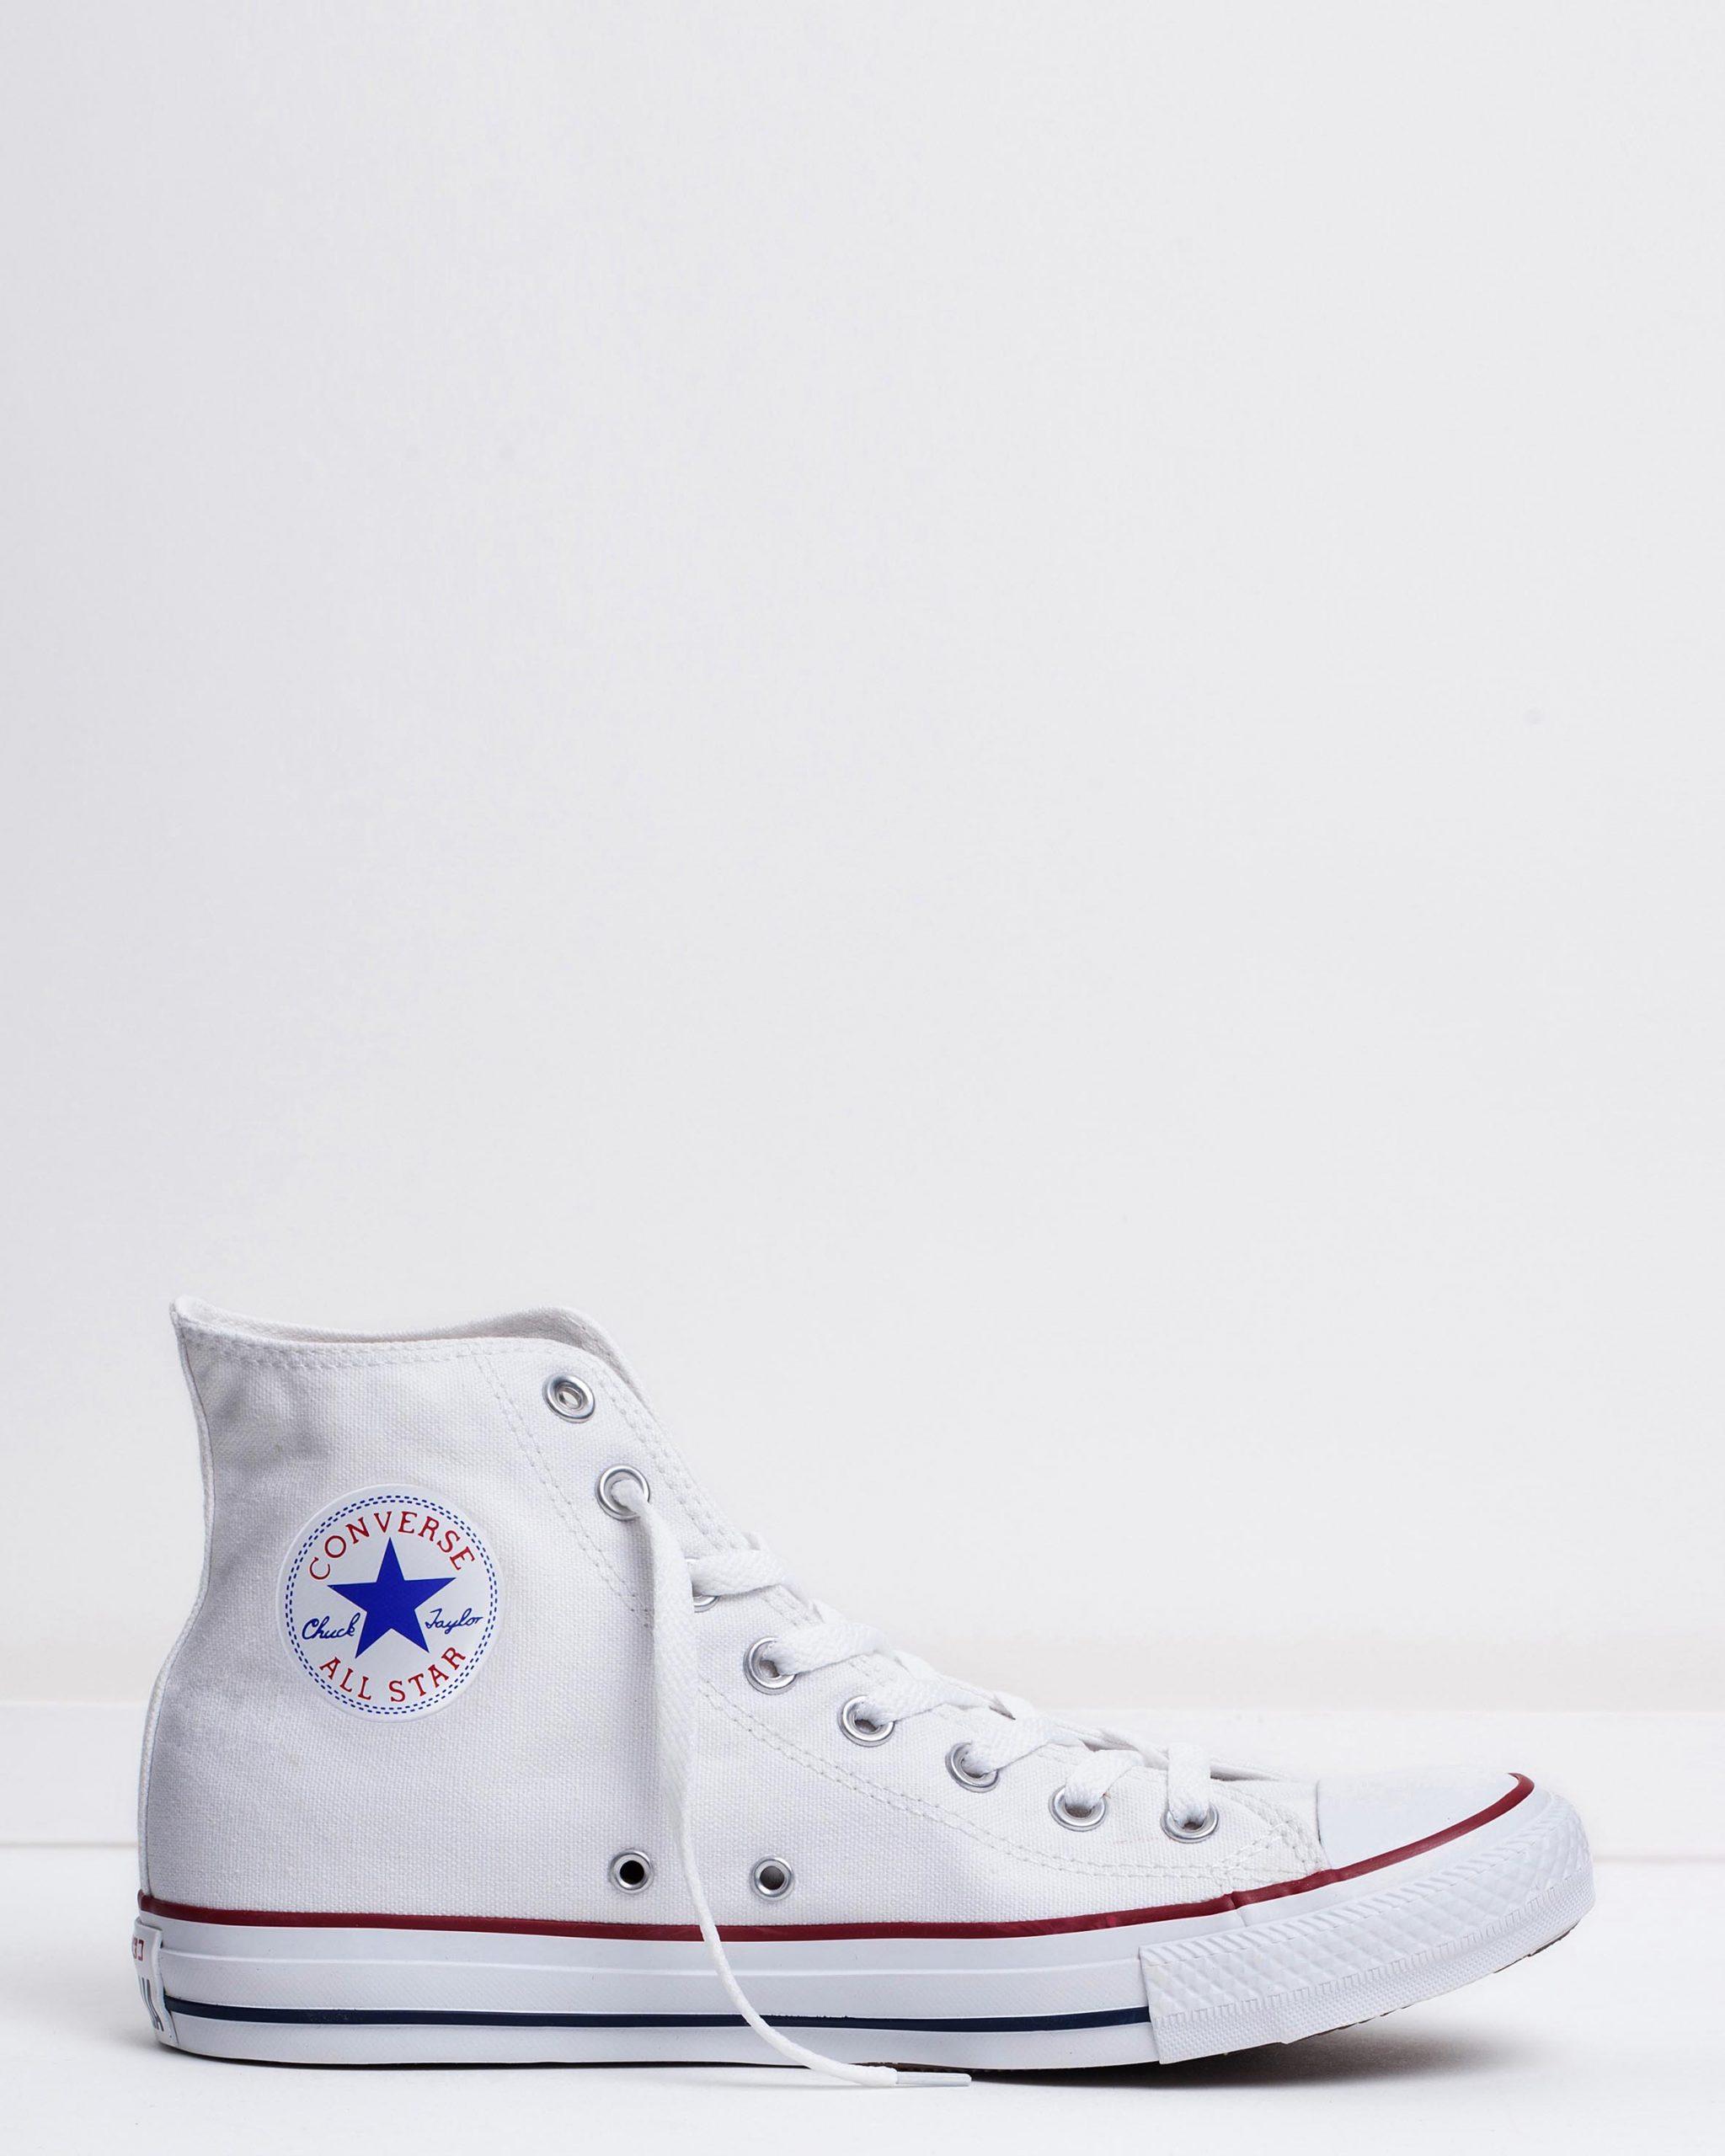 Converse Men's Chuck Taylor All Star Hi Optical White